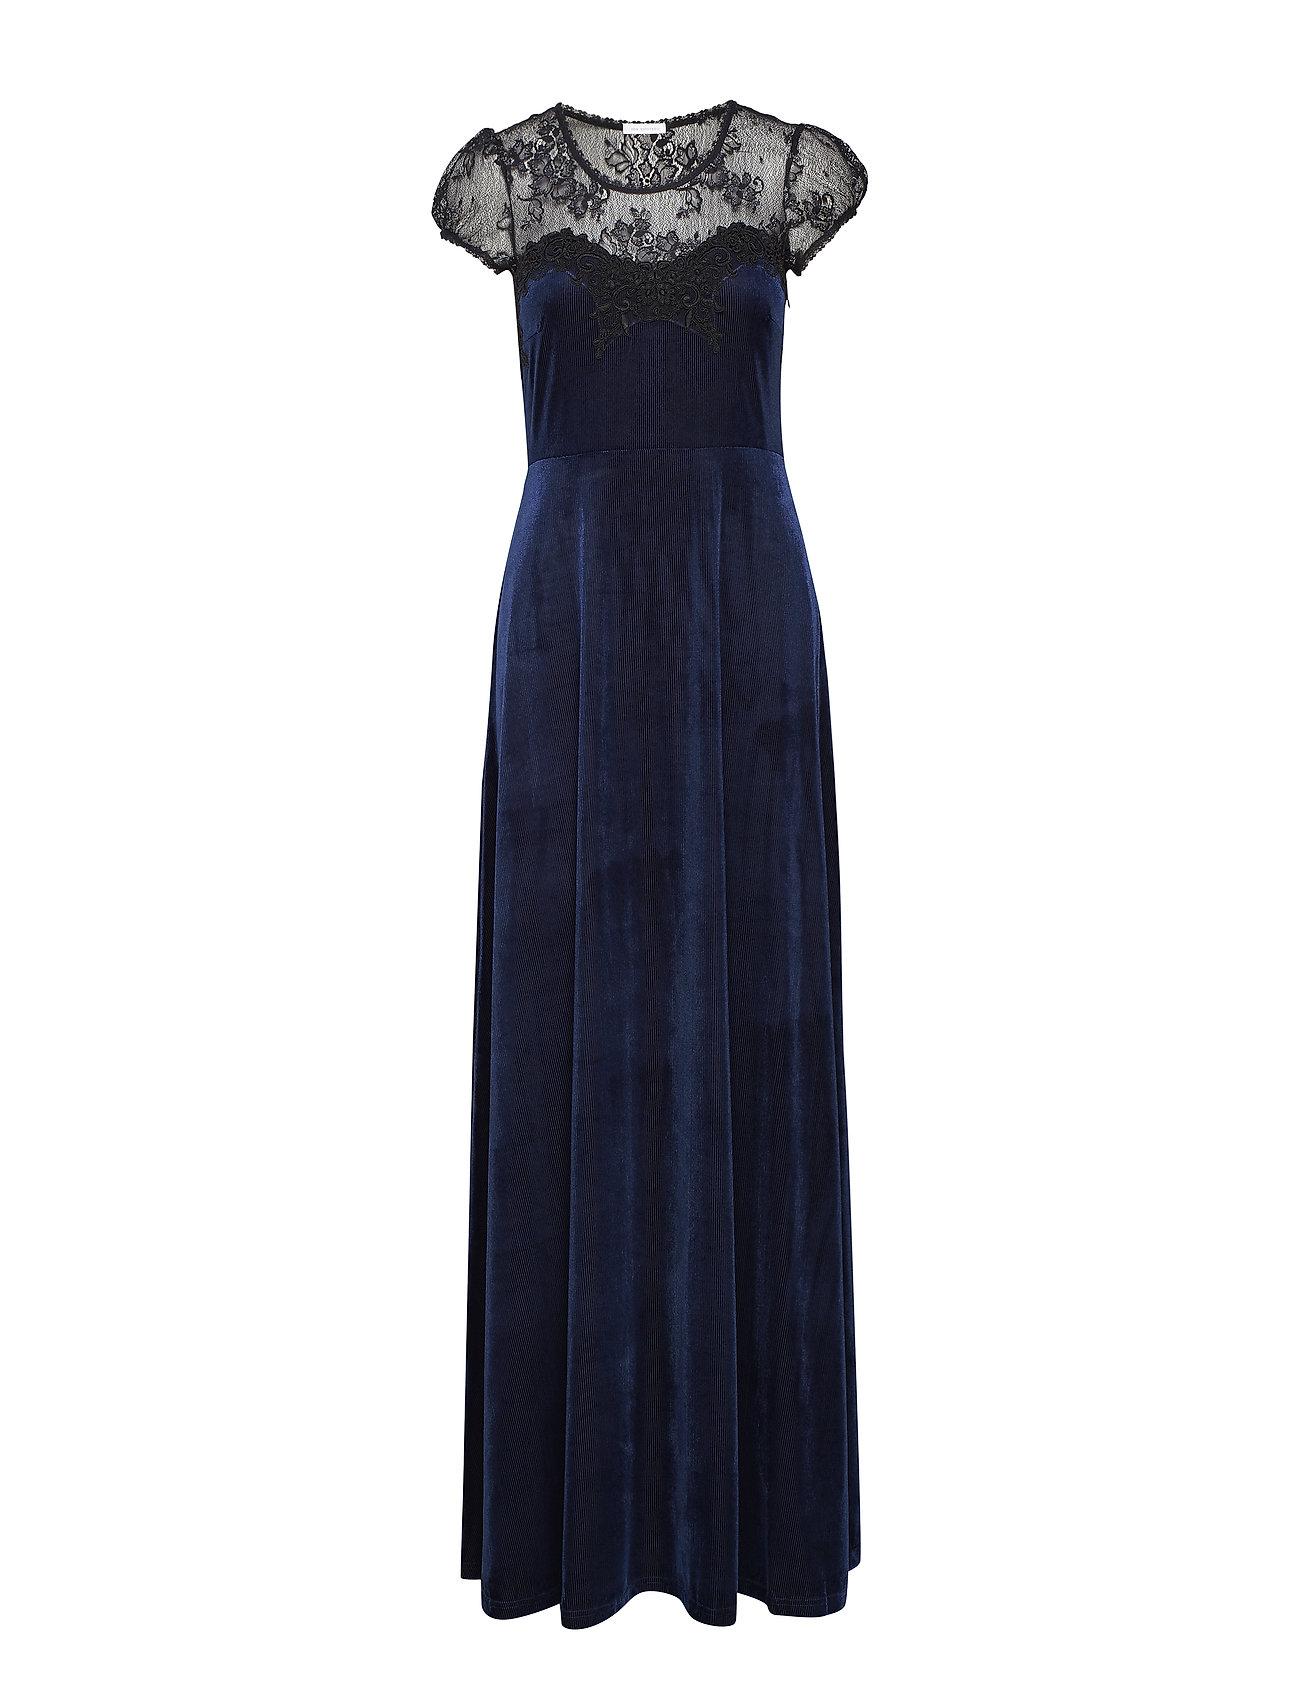 Ida Sjöstedt Dynasty Dress - NAVY